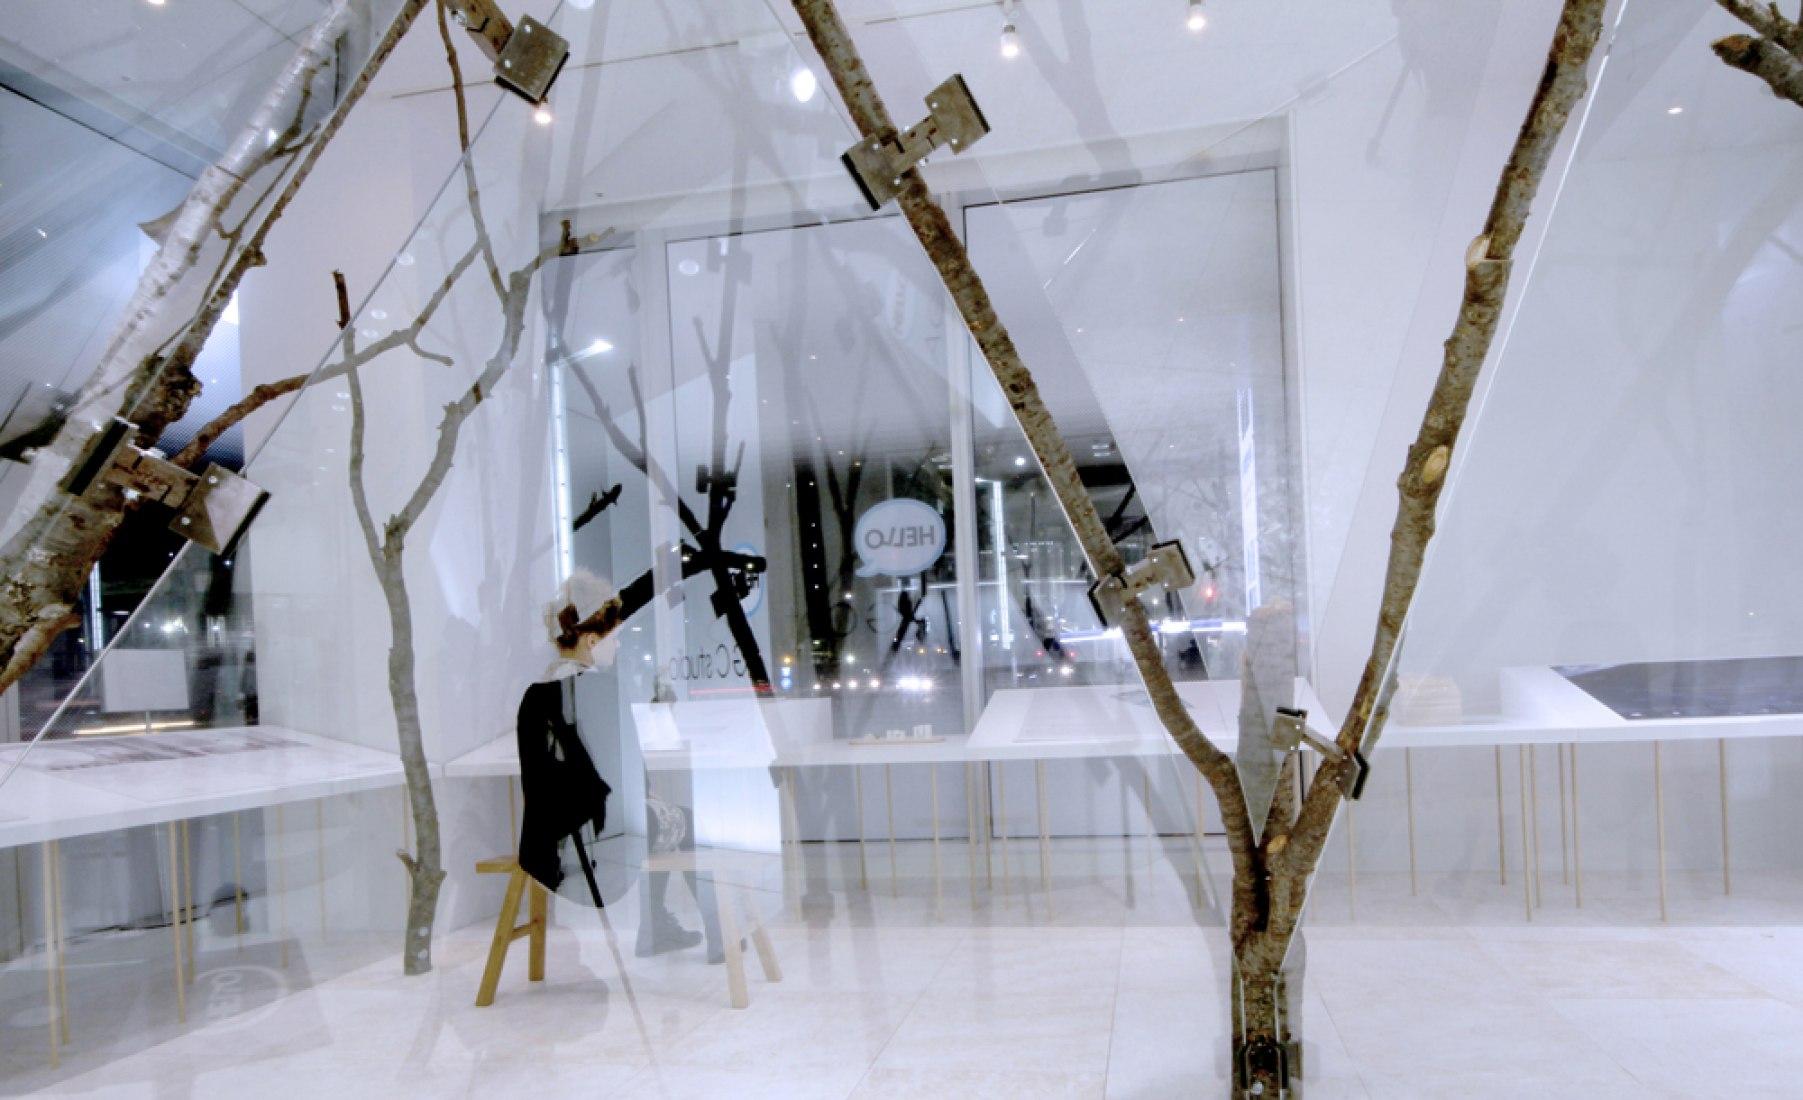 Glass Tea House, 1:1 scale model. Image courtesy of © KATOxVictoria.